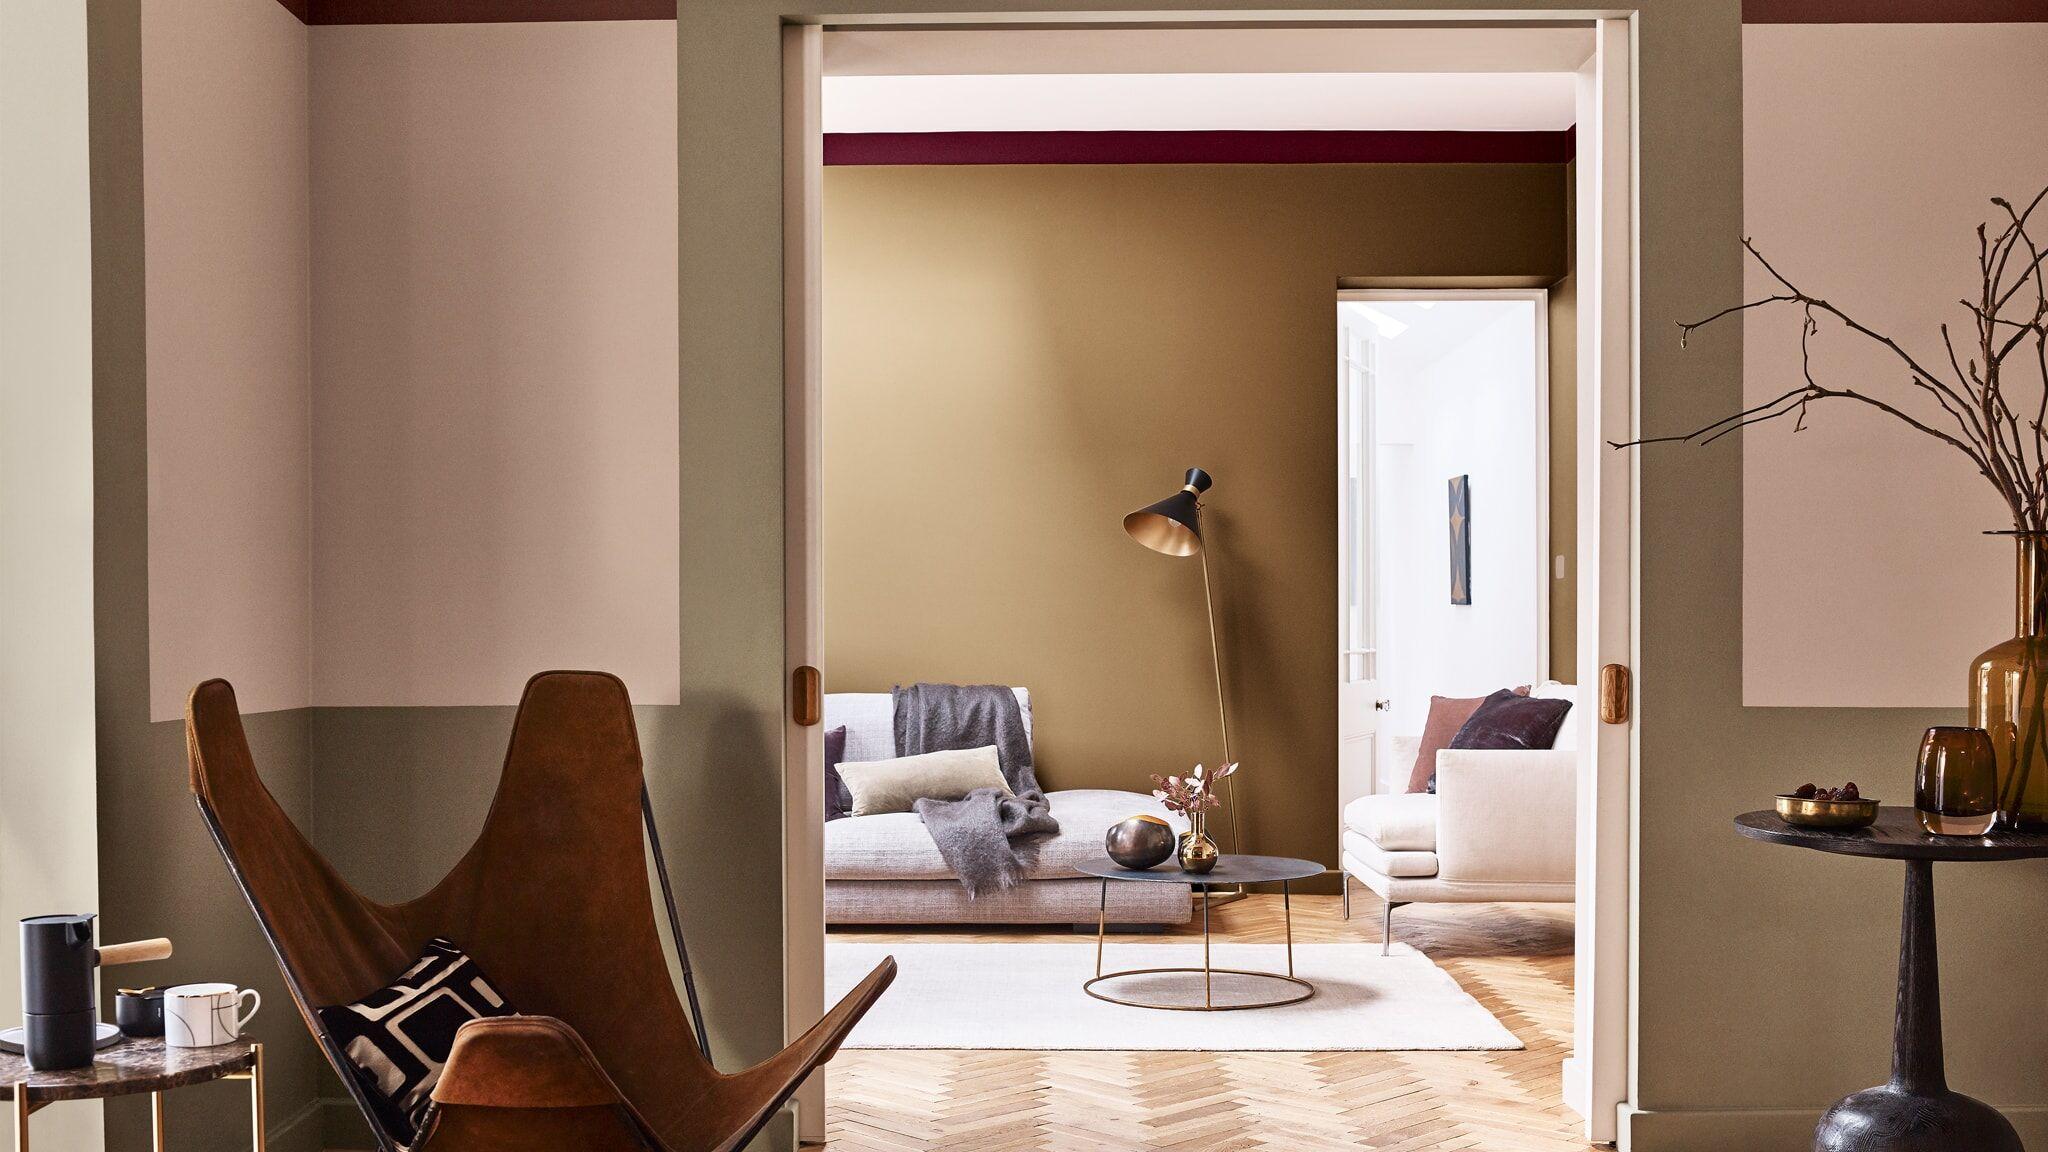 Nordsjo colour futures arets kulor 2019 en plats for att tanka vardagsrum inspiration sverige 31